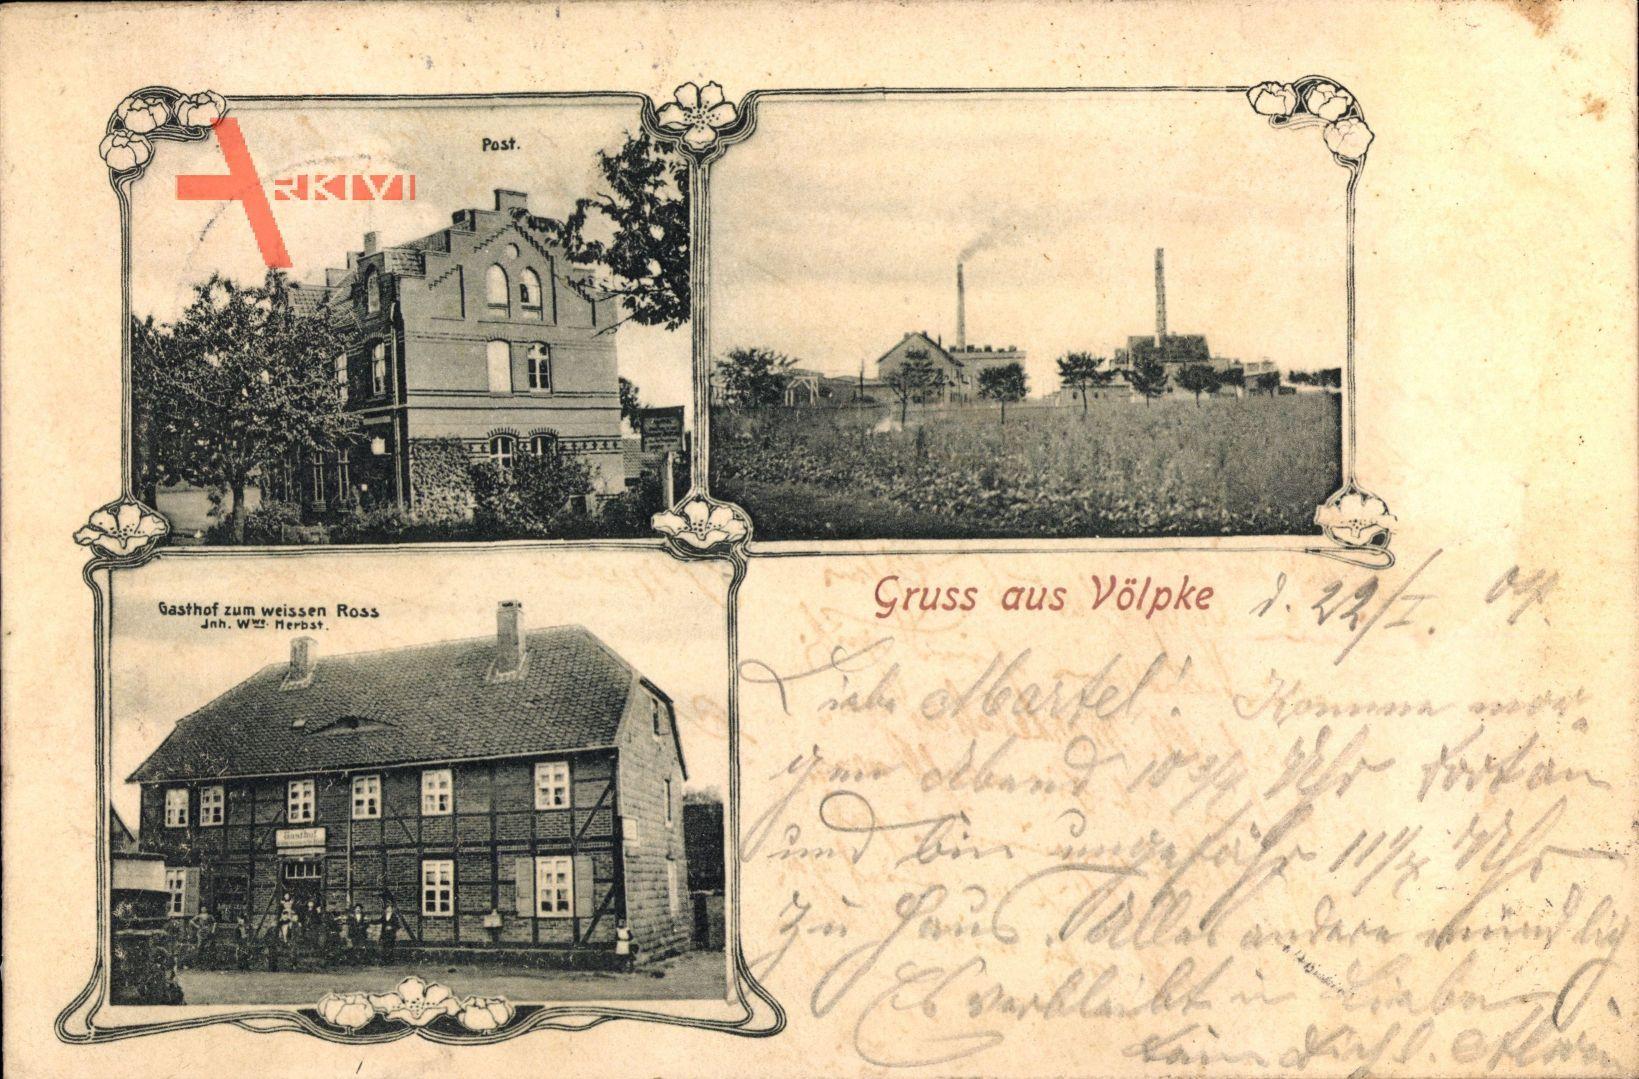 Völpke Kreis Börde, Post, Gasthof zum weissen Ross, W. Herbst, Fabrik